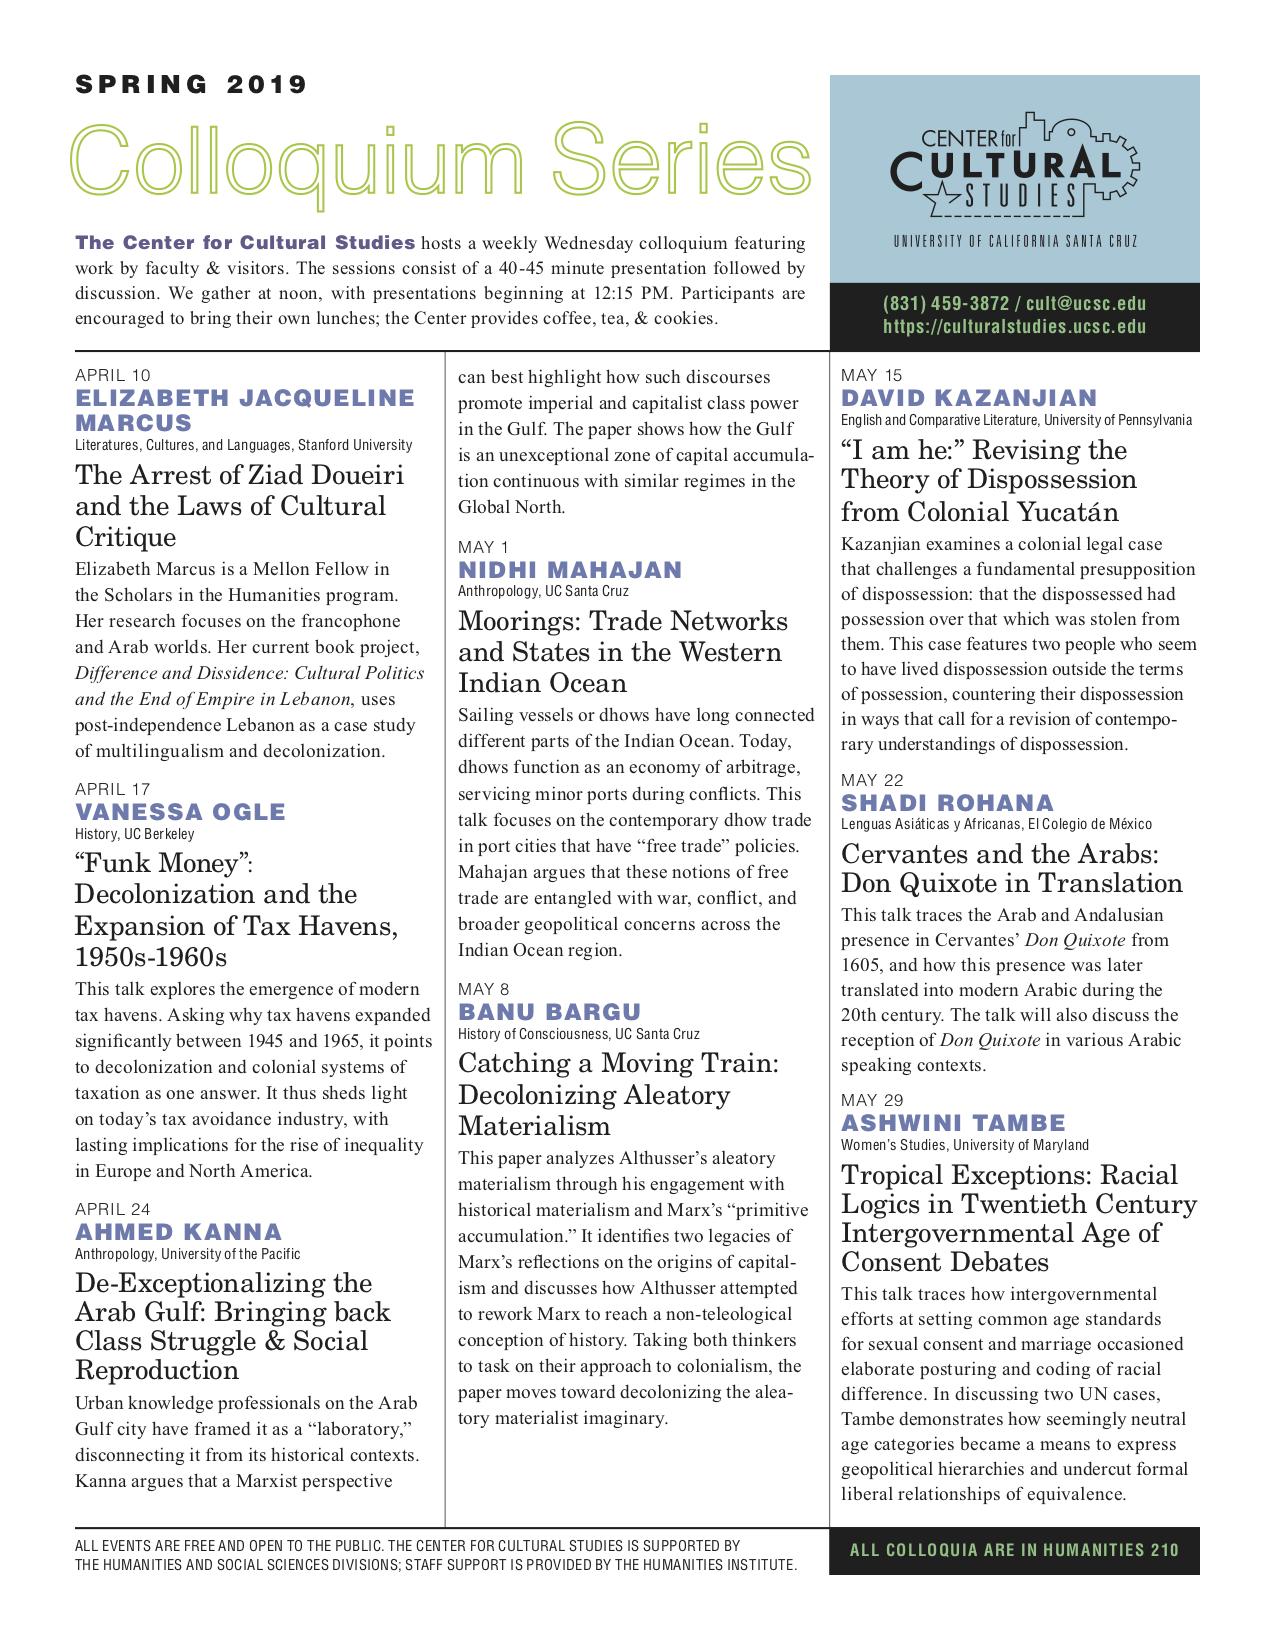 The Center for Cultural Studies Spring 2019 Newsletter